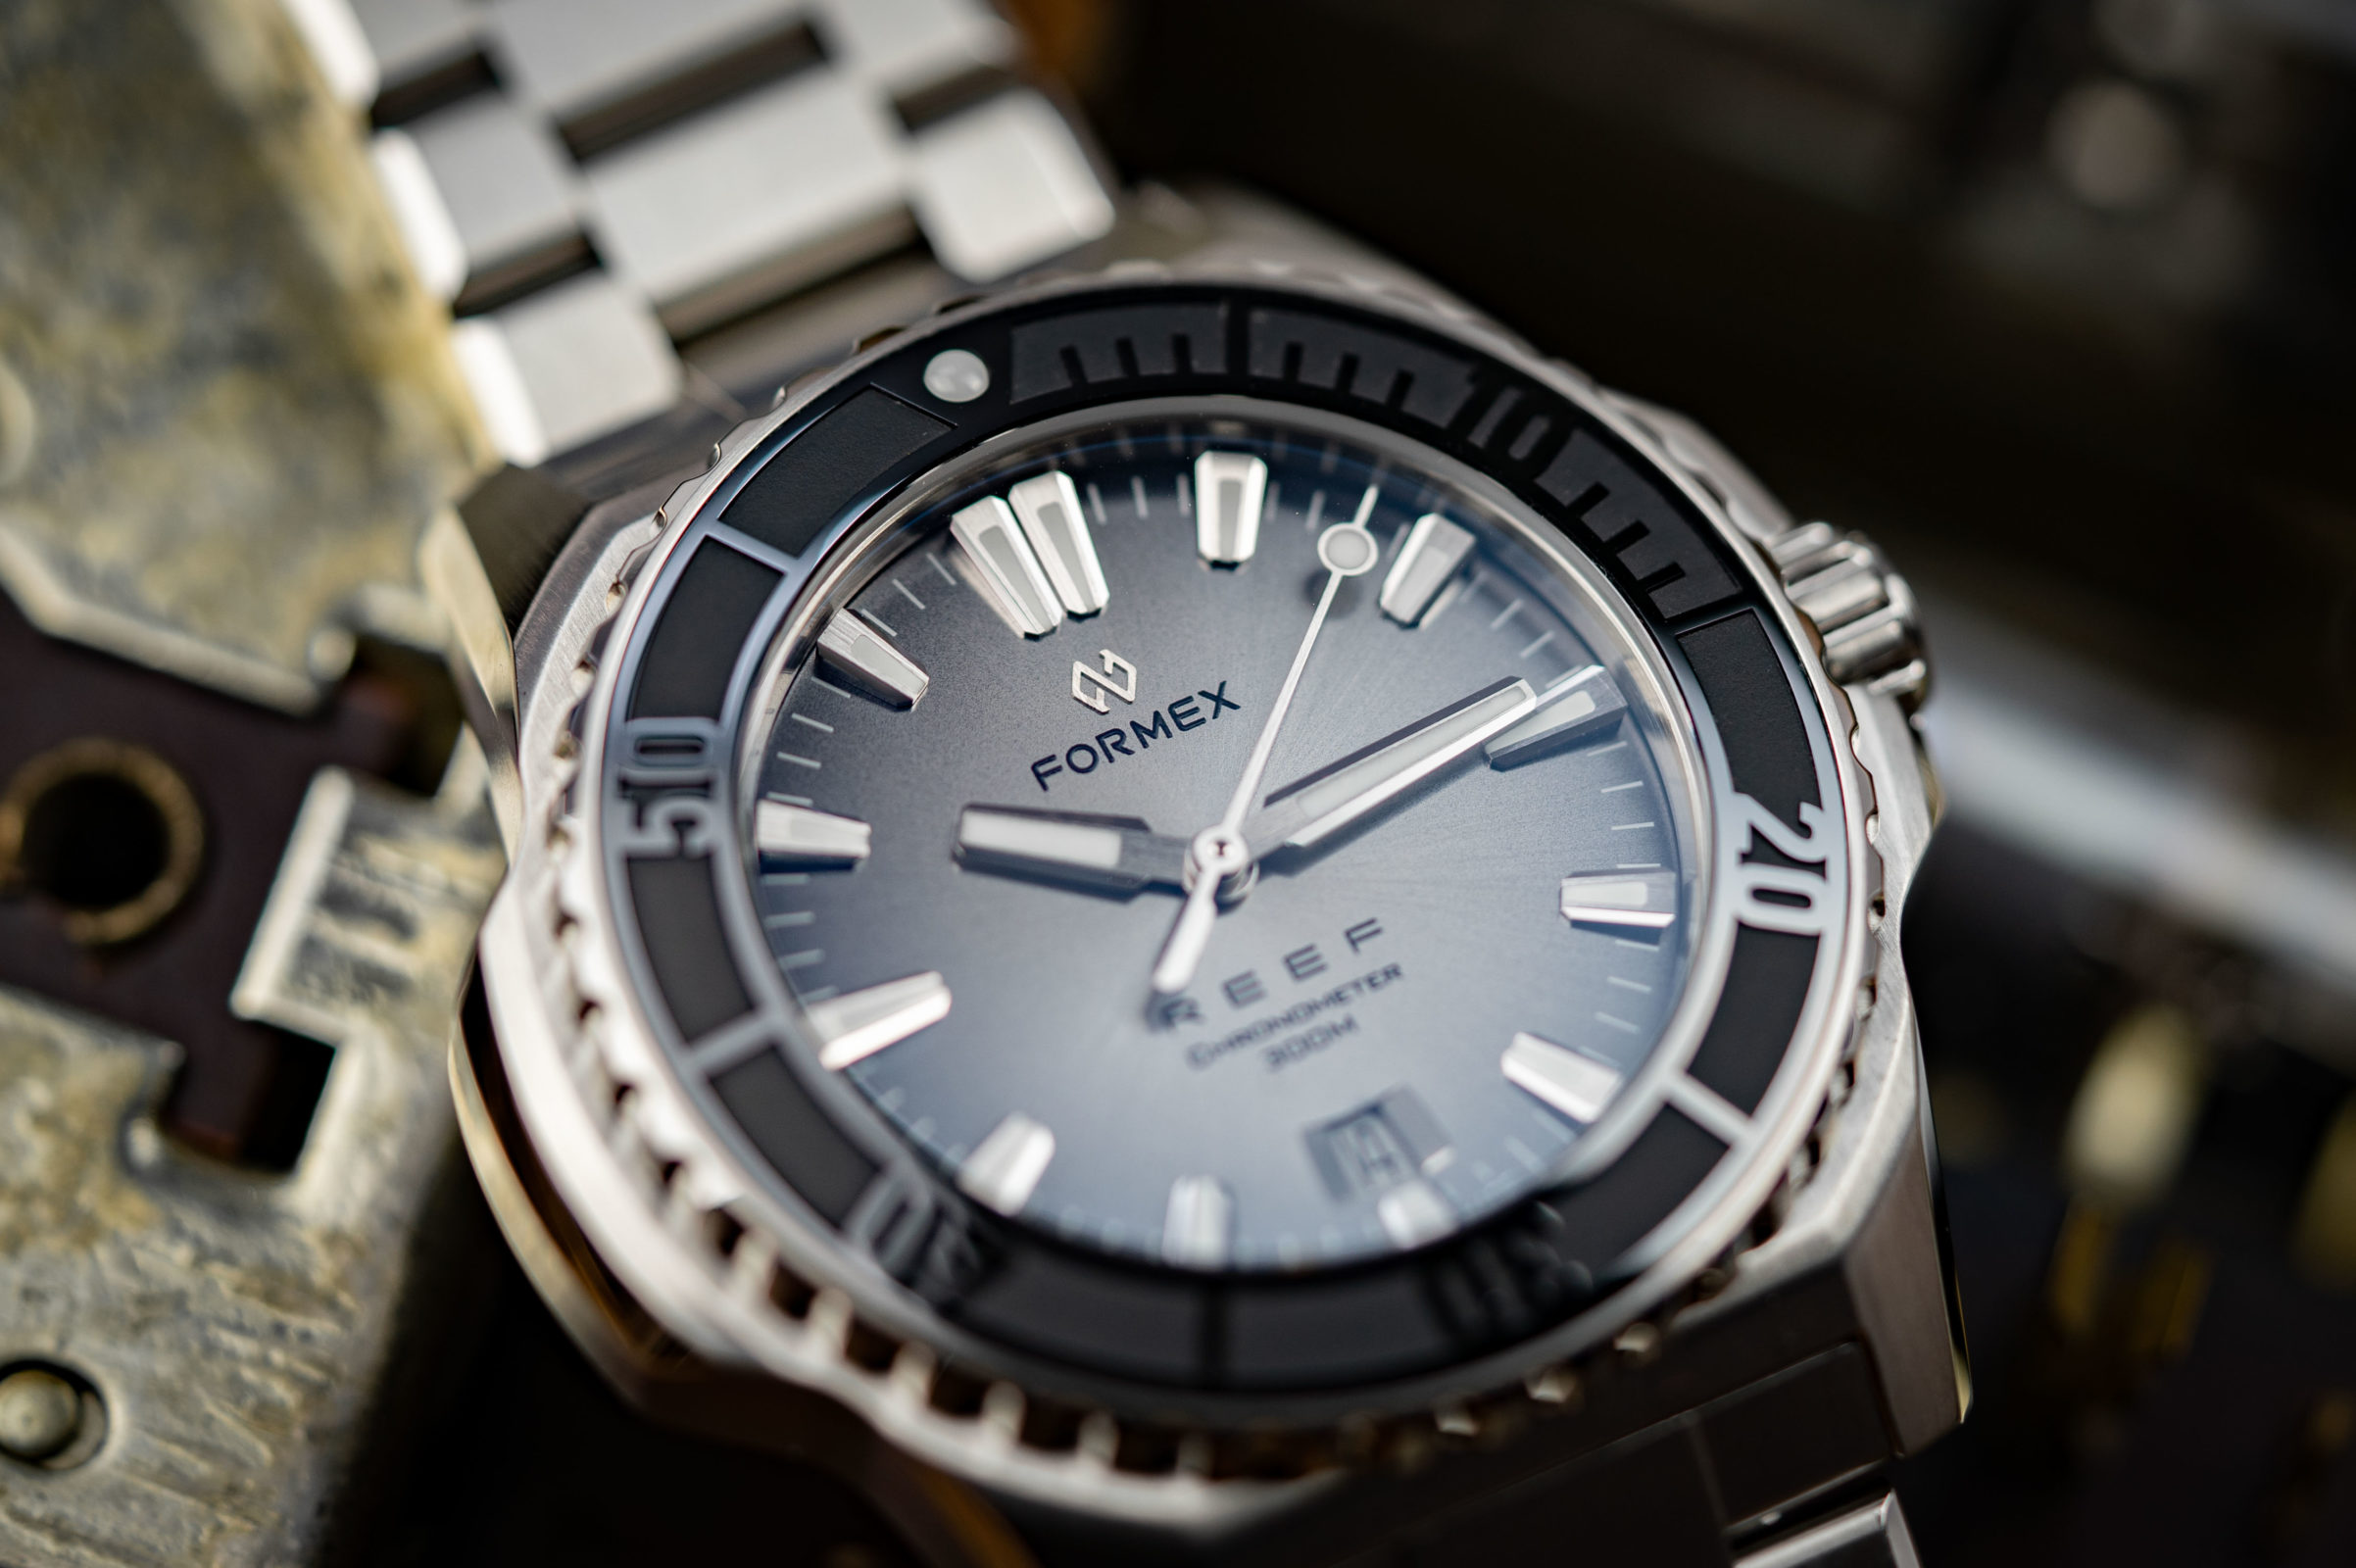 Formex-Reef-Automatik-Chronometer-300m-4